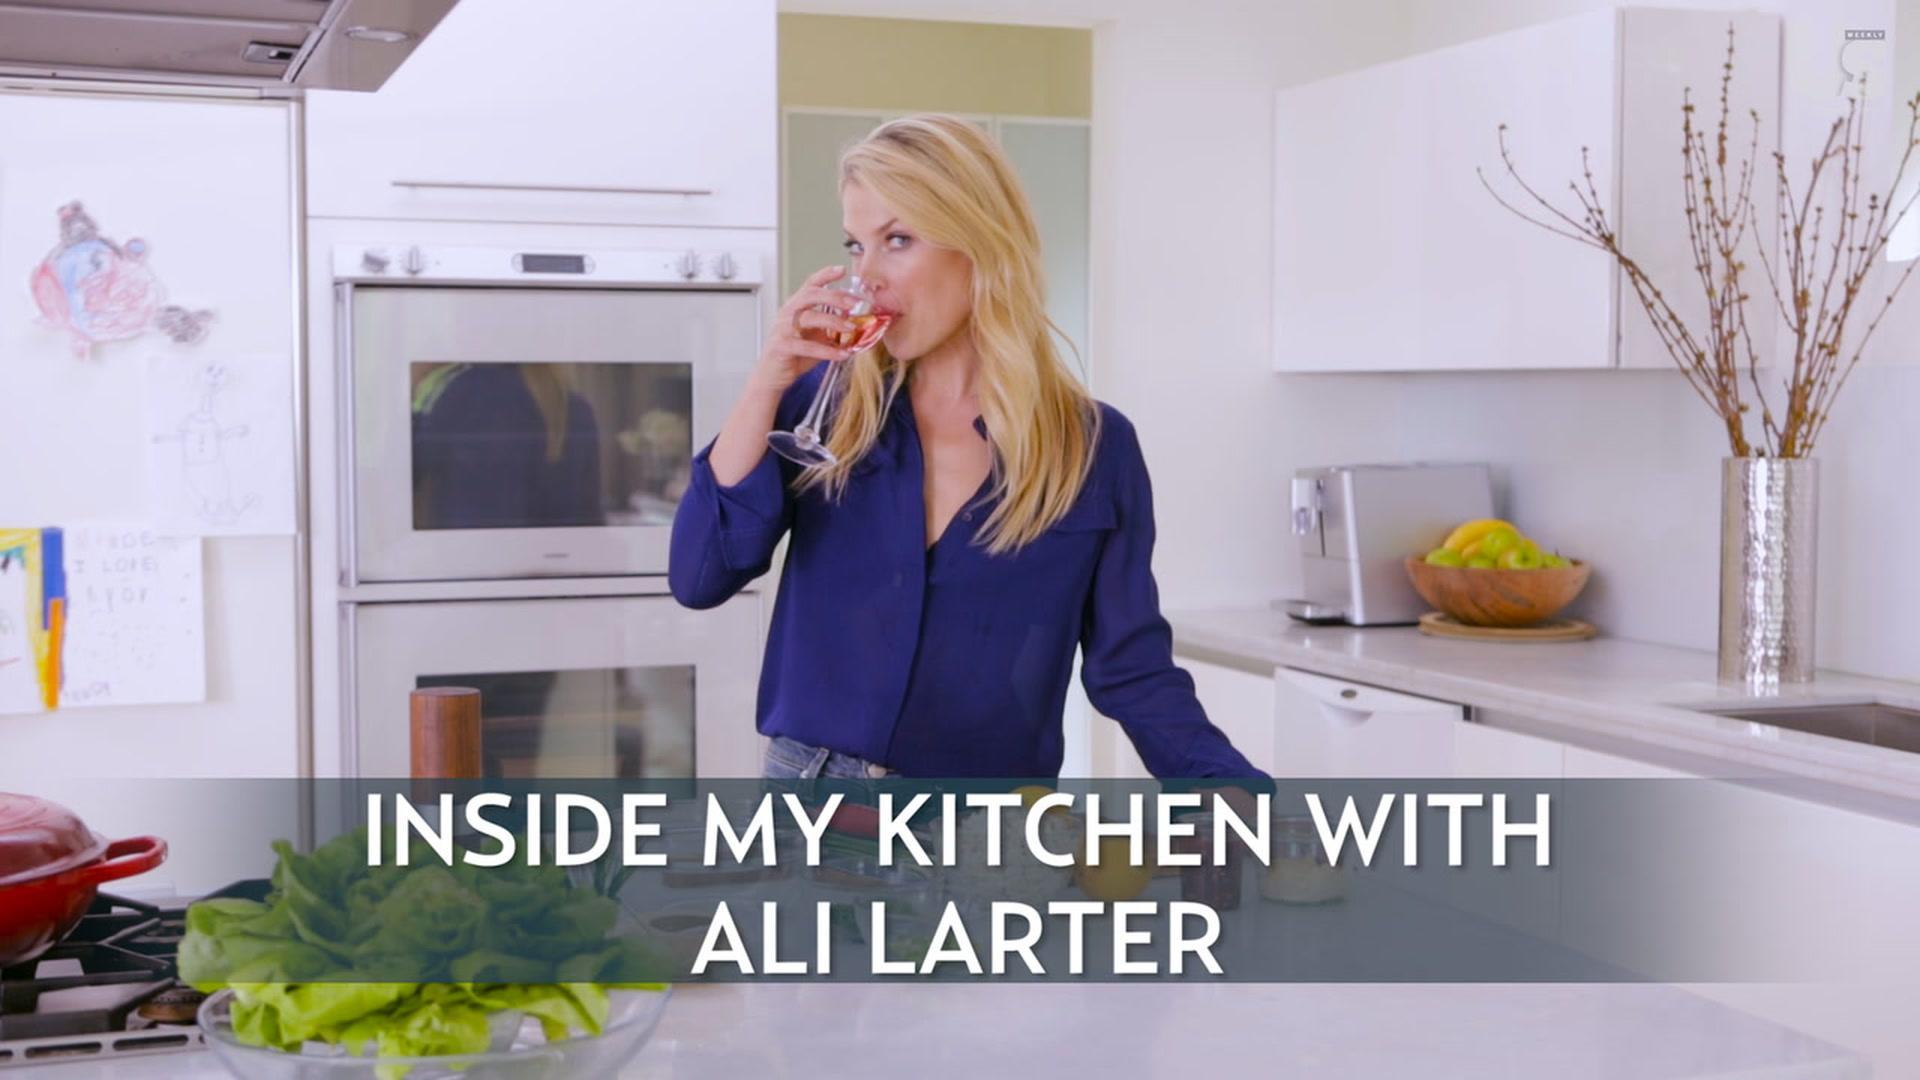 Inside My Kitchen With Ali Larter